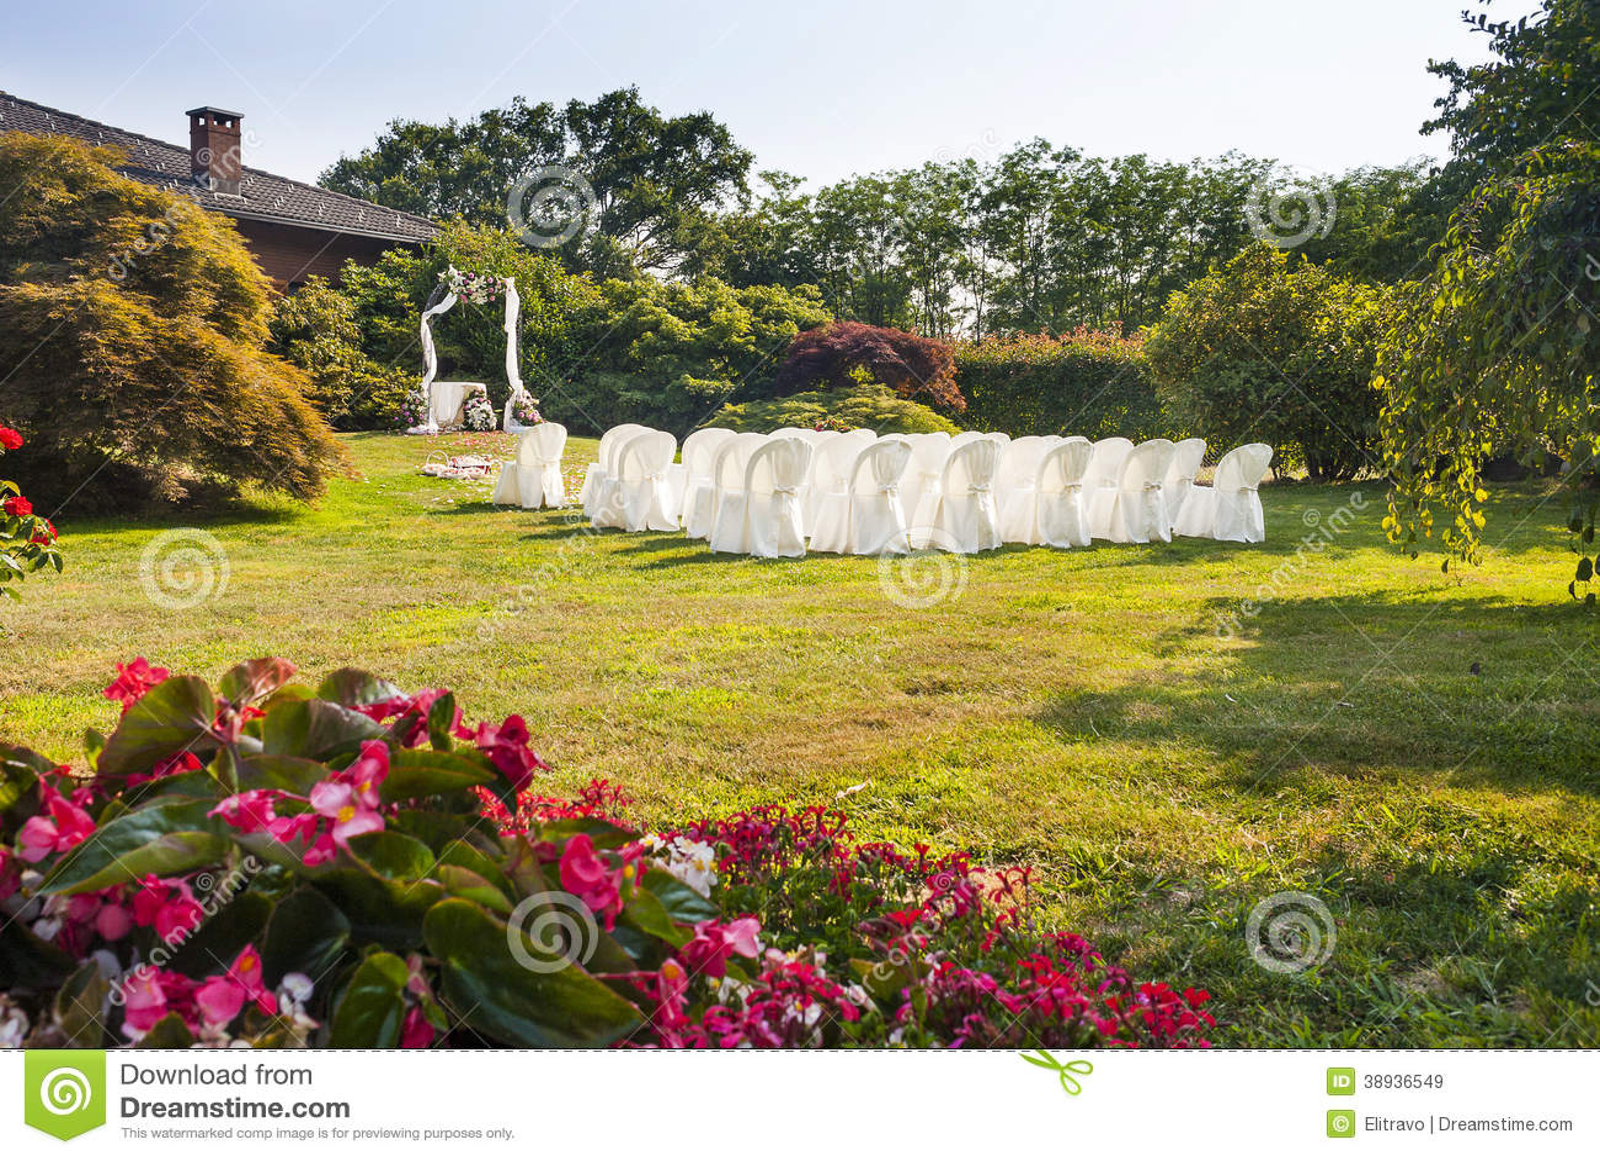 Wedding Ceremony In Sunny Garden Stock Photo Image